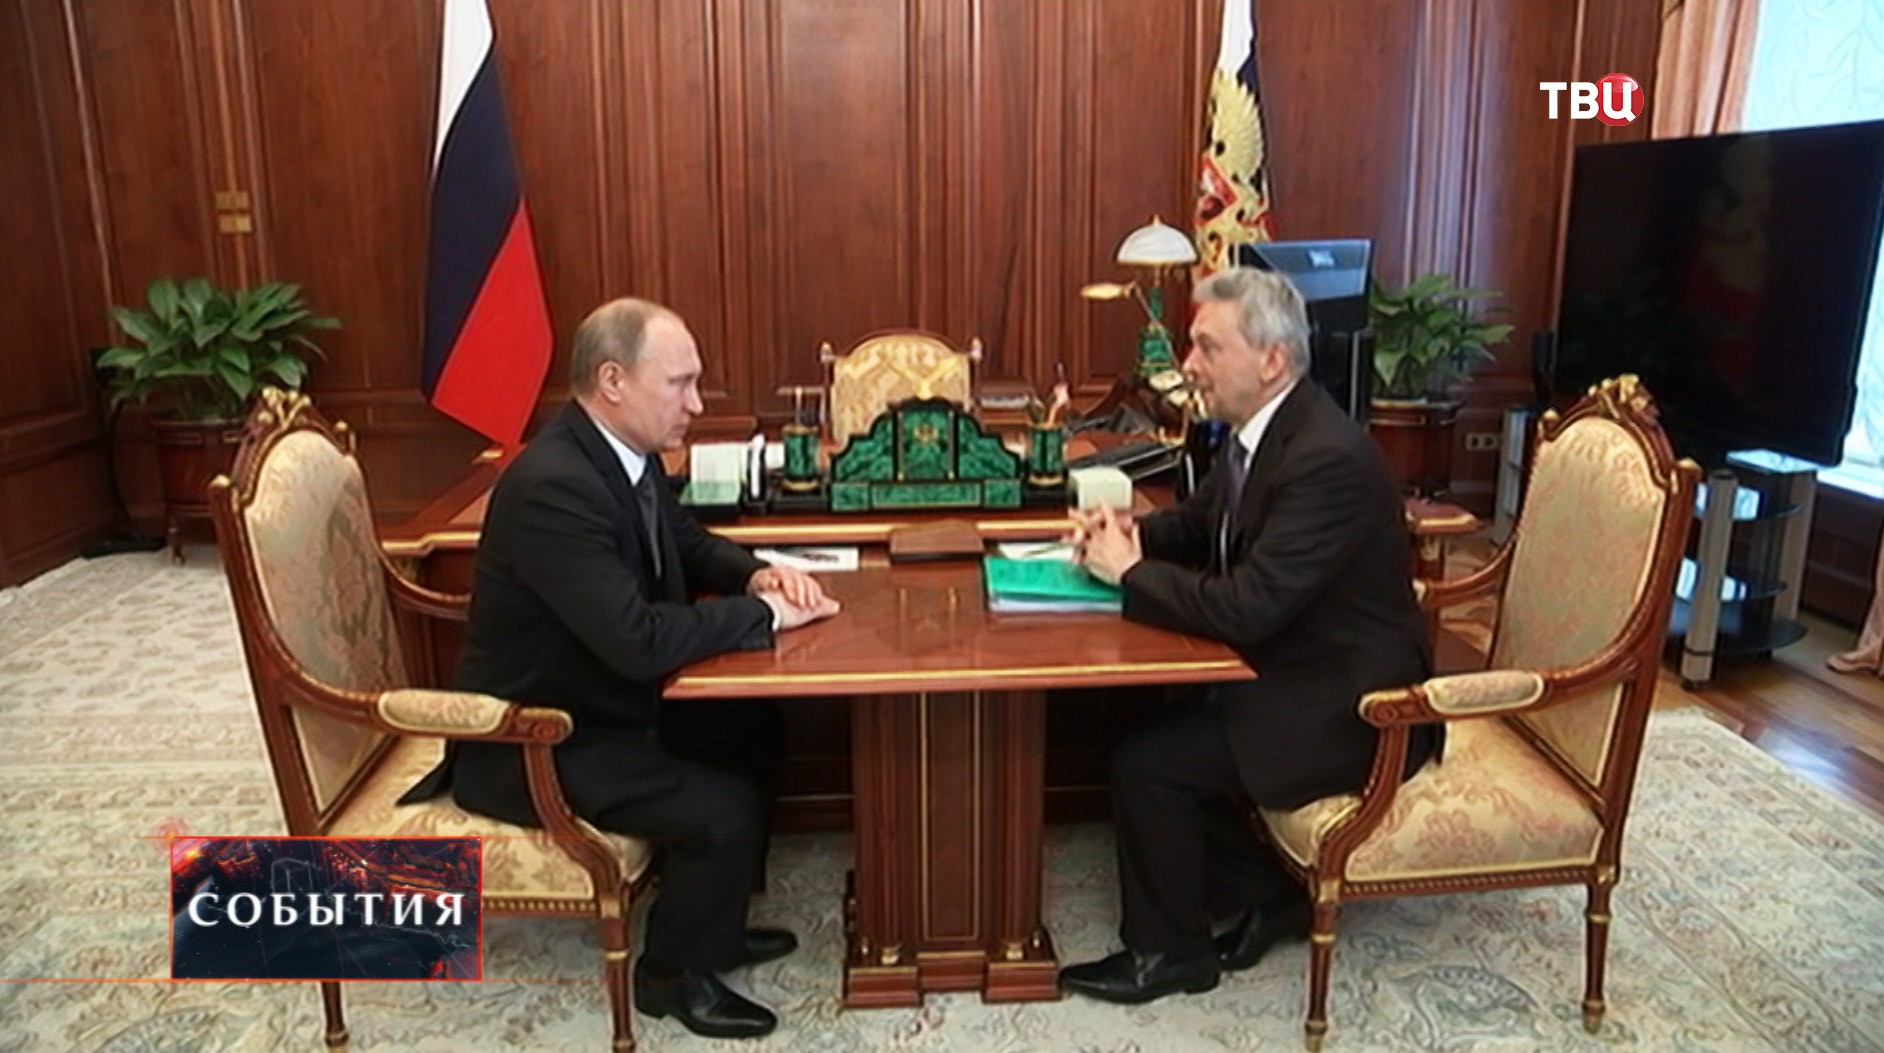 Владимир Путин и вице-президент РАМН Иван Дедов во время встречи